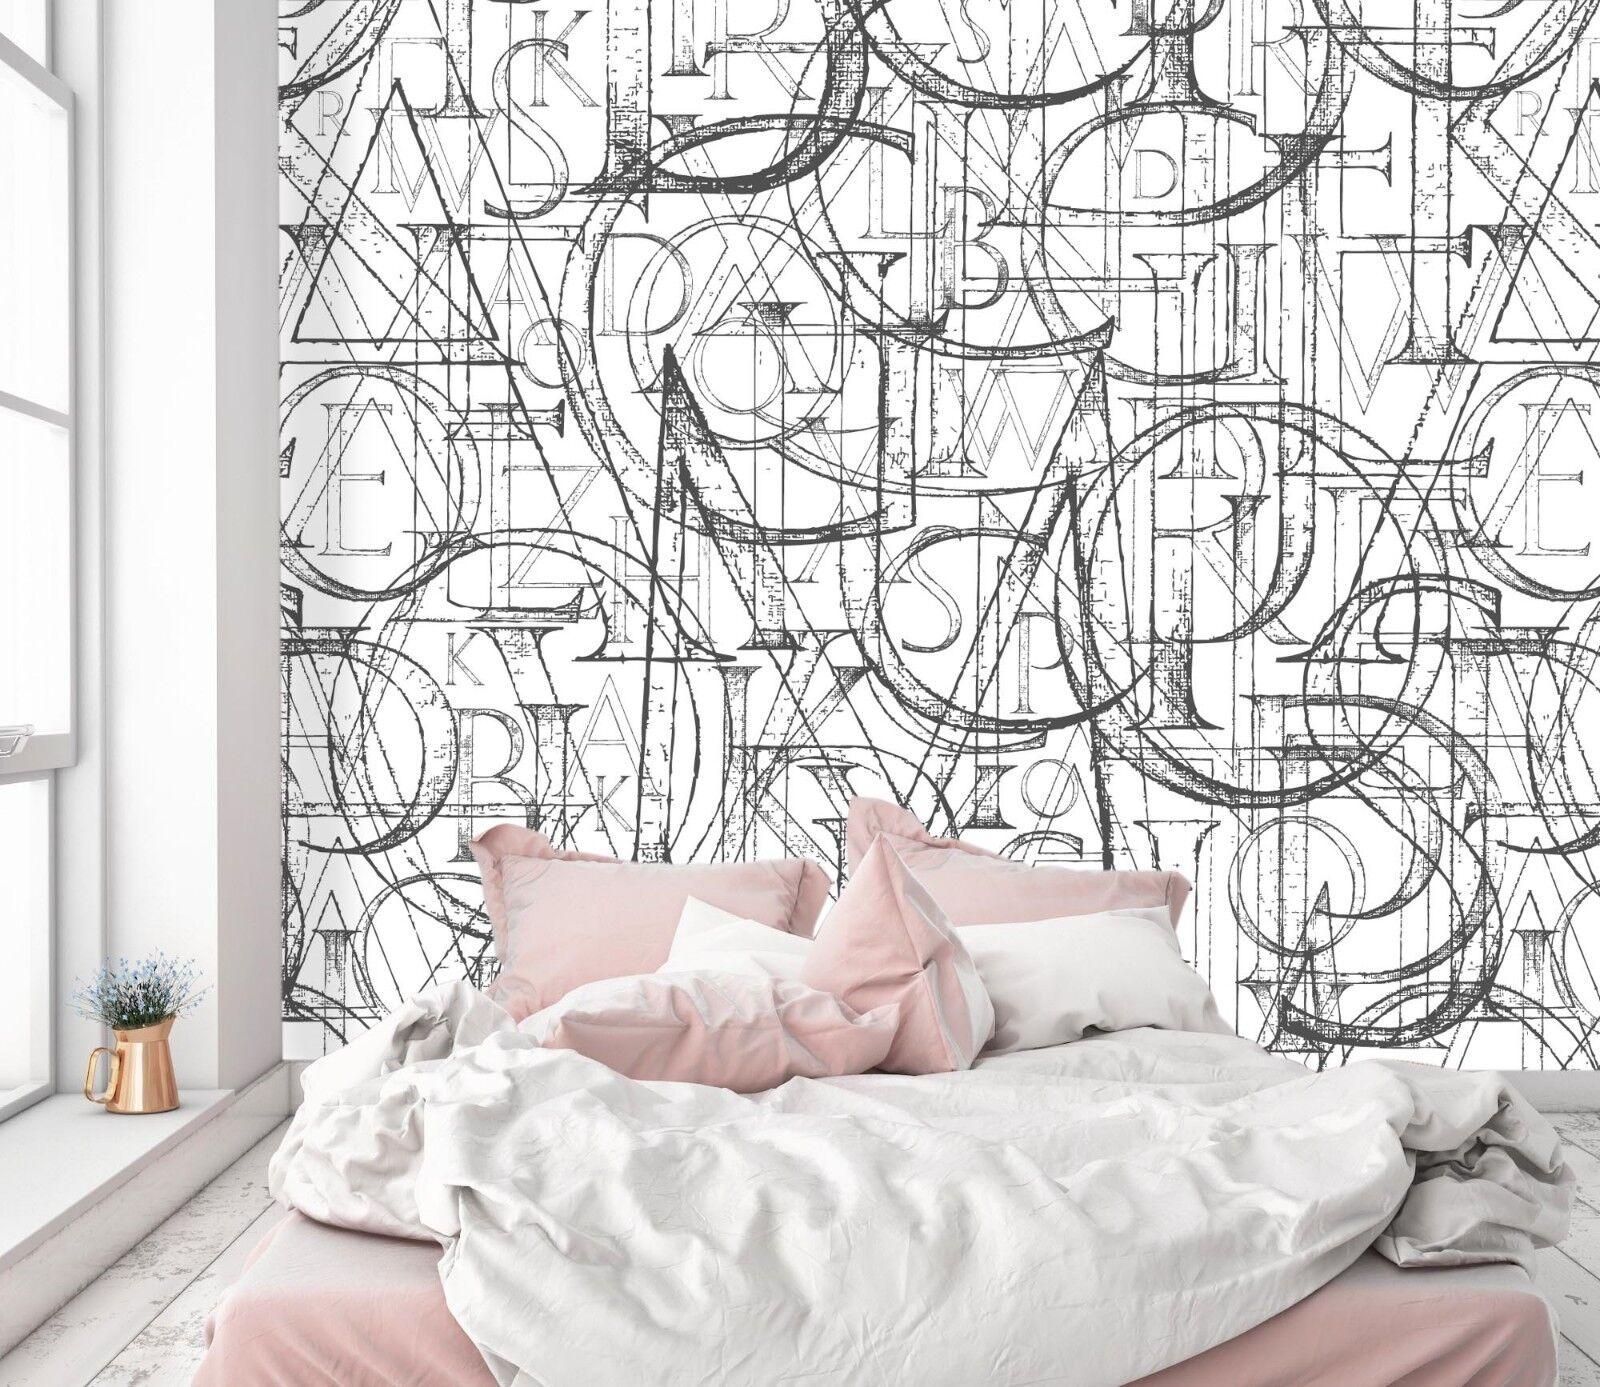 3D Art  Lines Graffiti 45 Wallpaper Murals Wall Print Wallpaper Mural AJ WALL UK